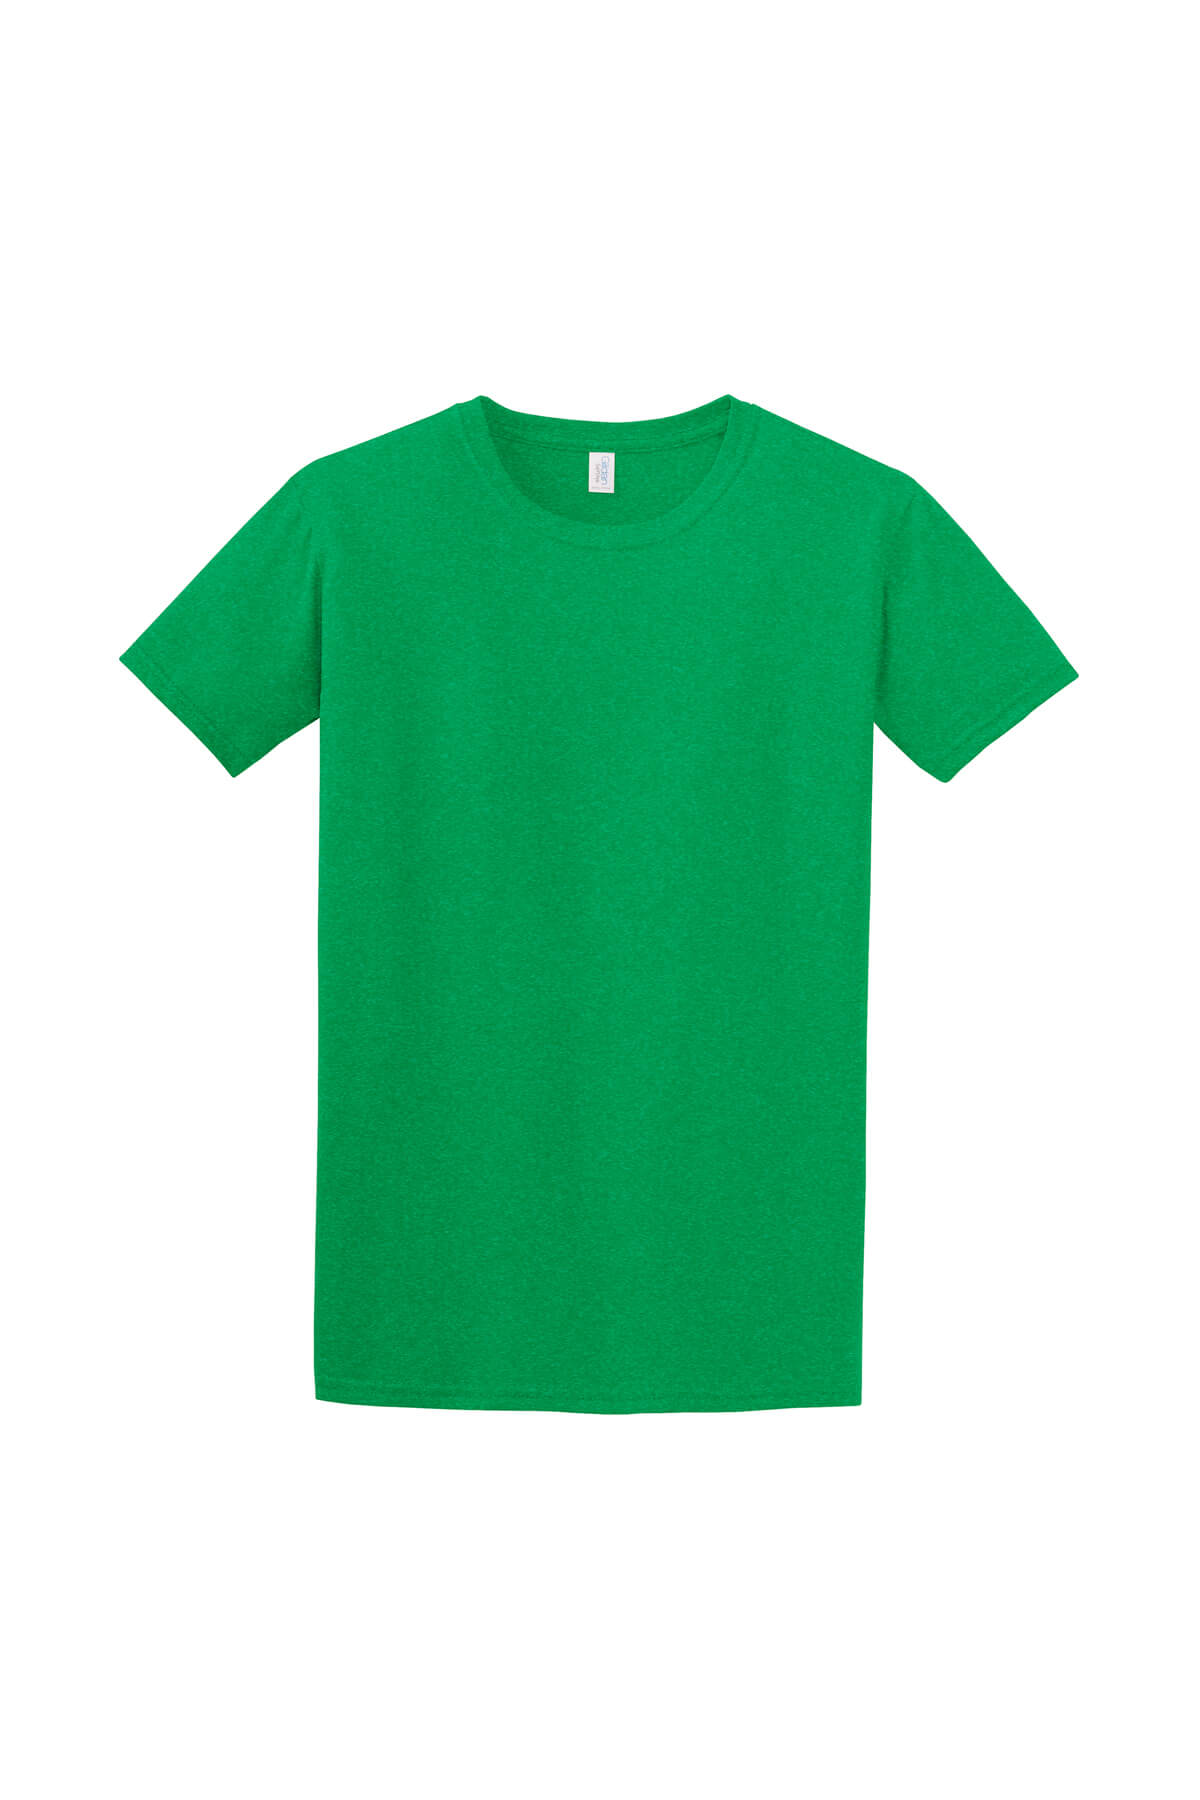 Irish Green T-Shirt Front